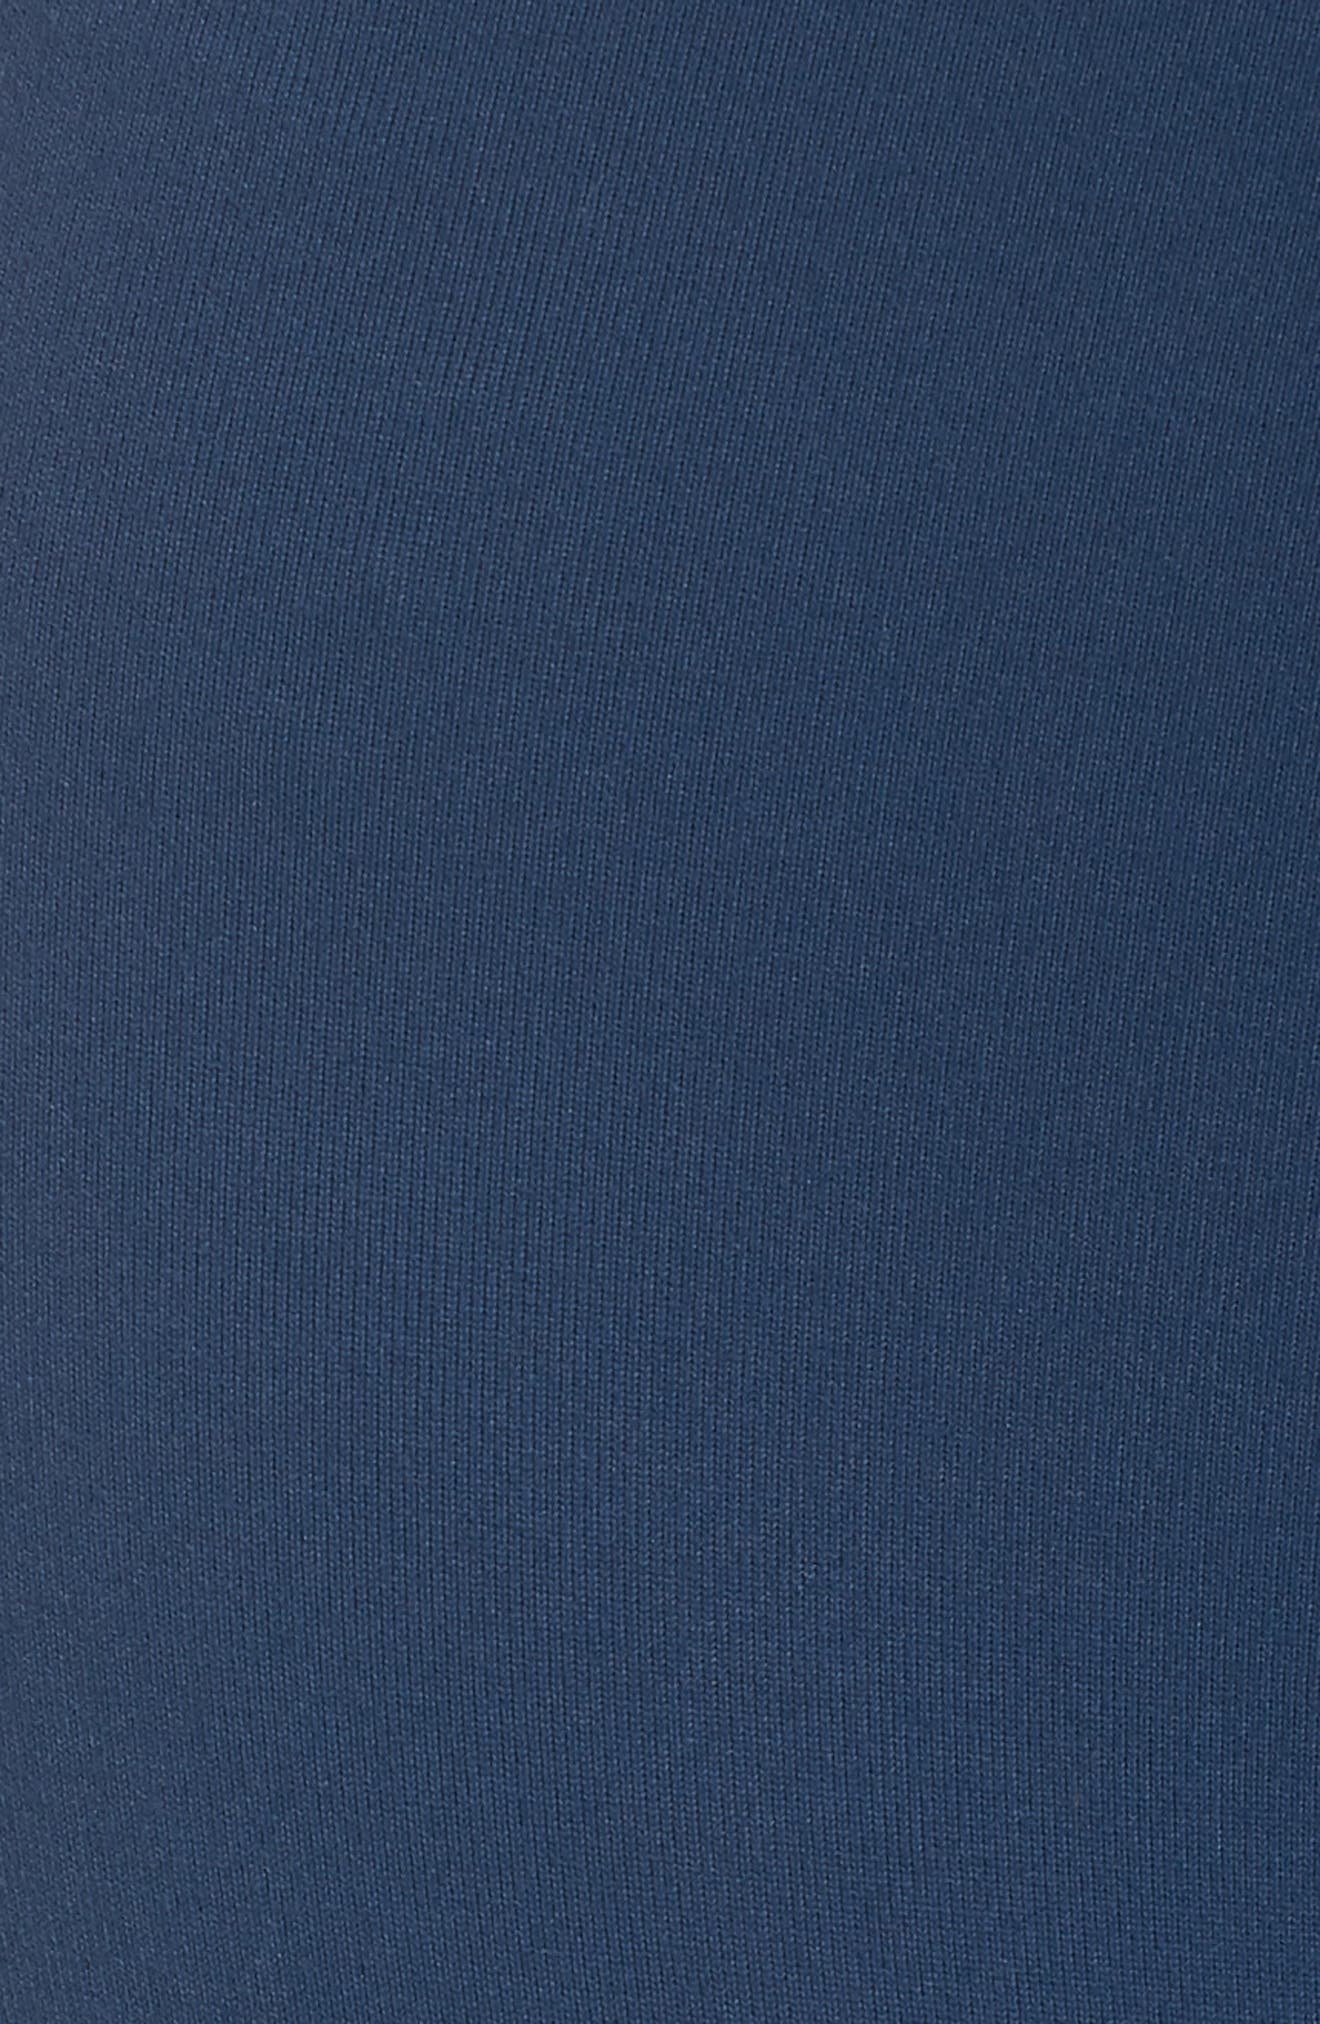 Cross the Line Crop Leggings,                             Alternate thumbnail 6, color,                             Blue Insignia